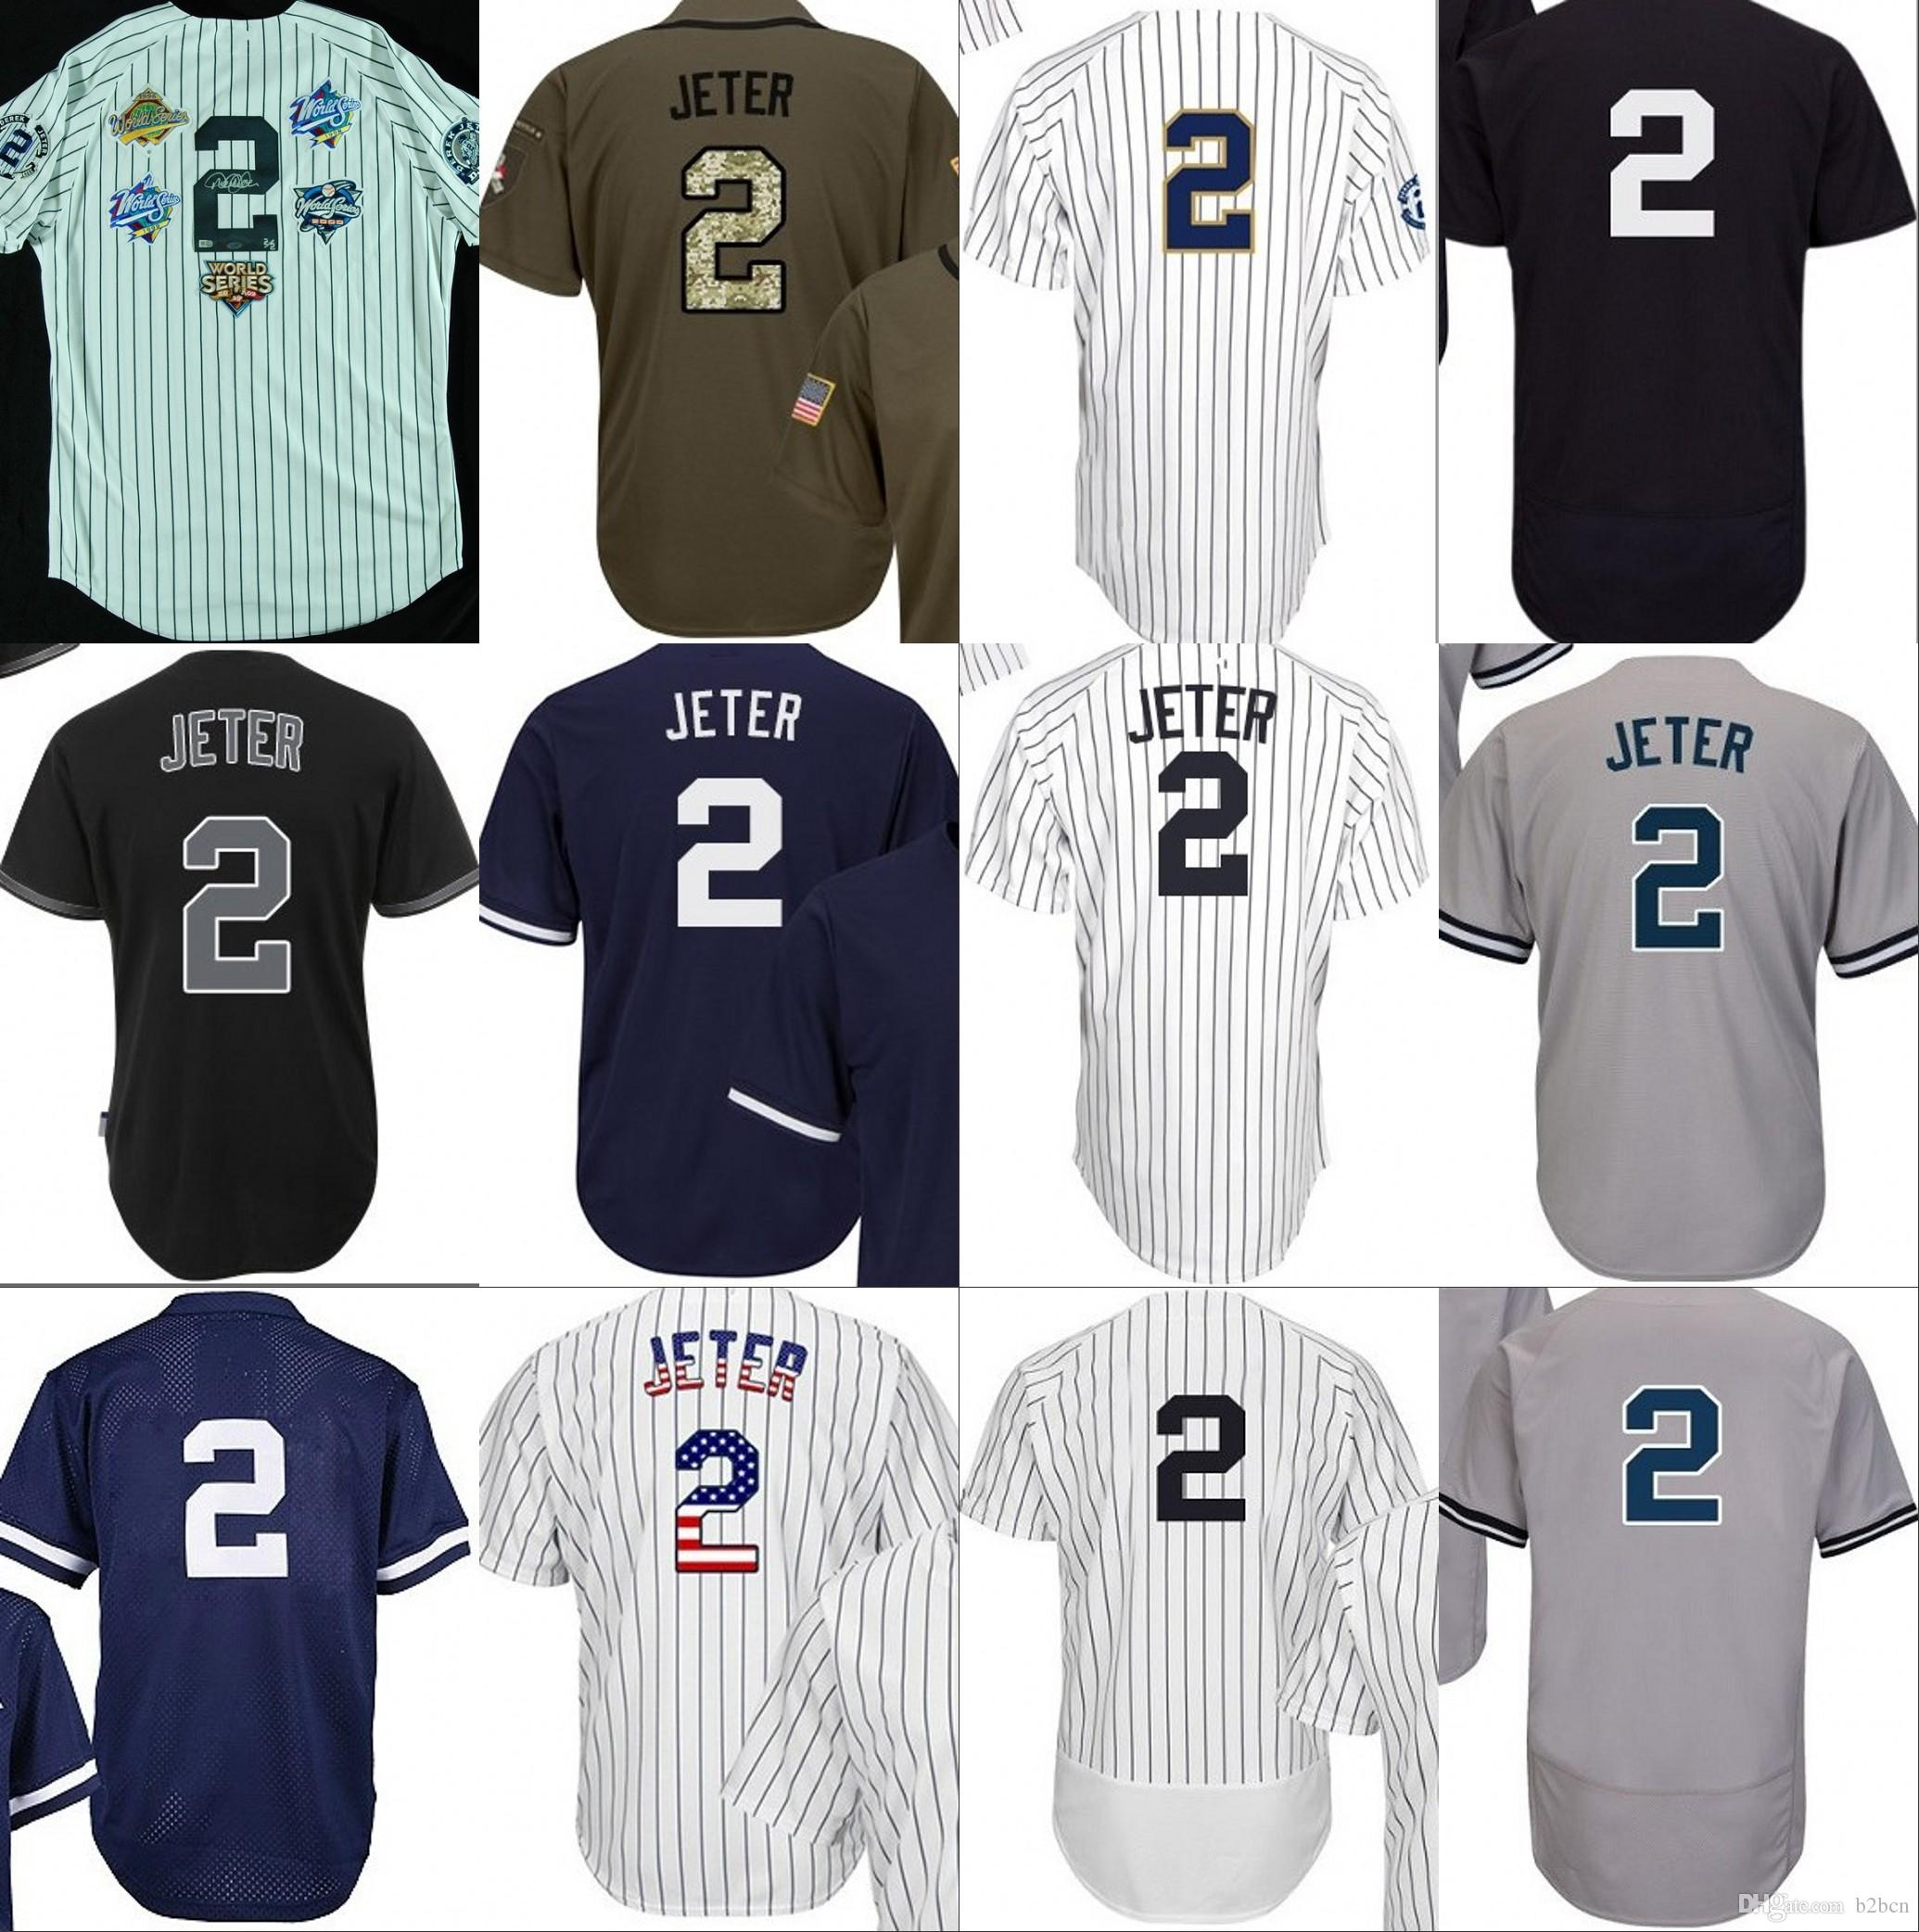 newest collection 674e6 c5008 discount 2 derek jeter jersey 7b862 37f5f